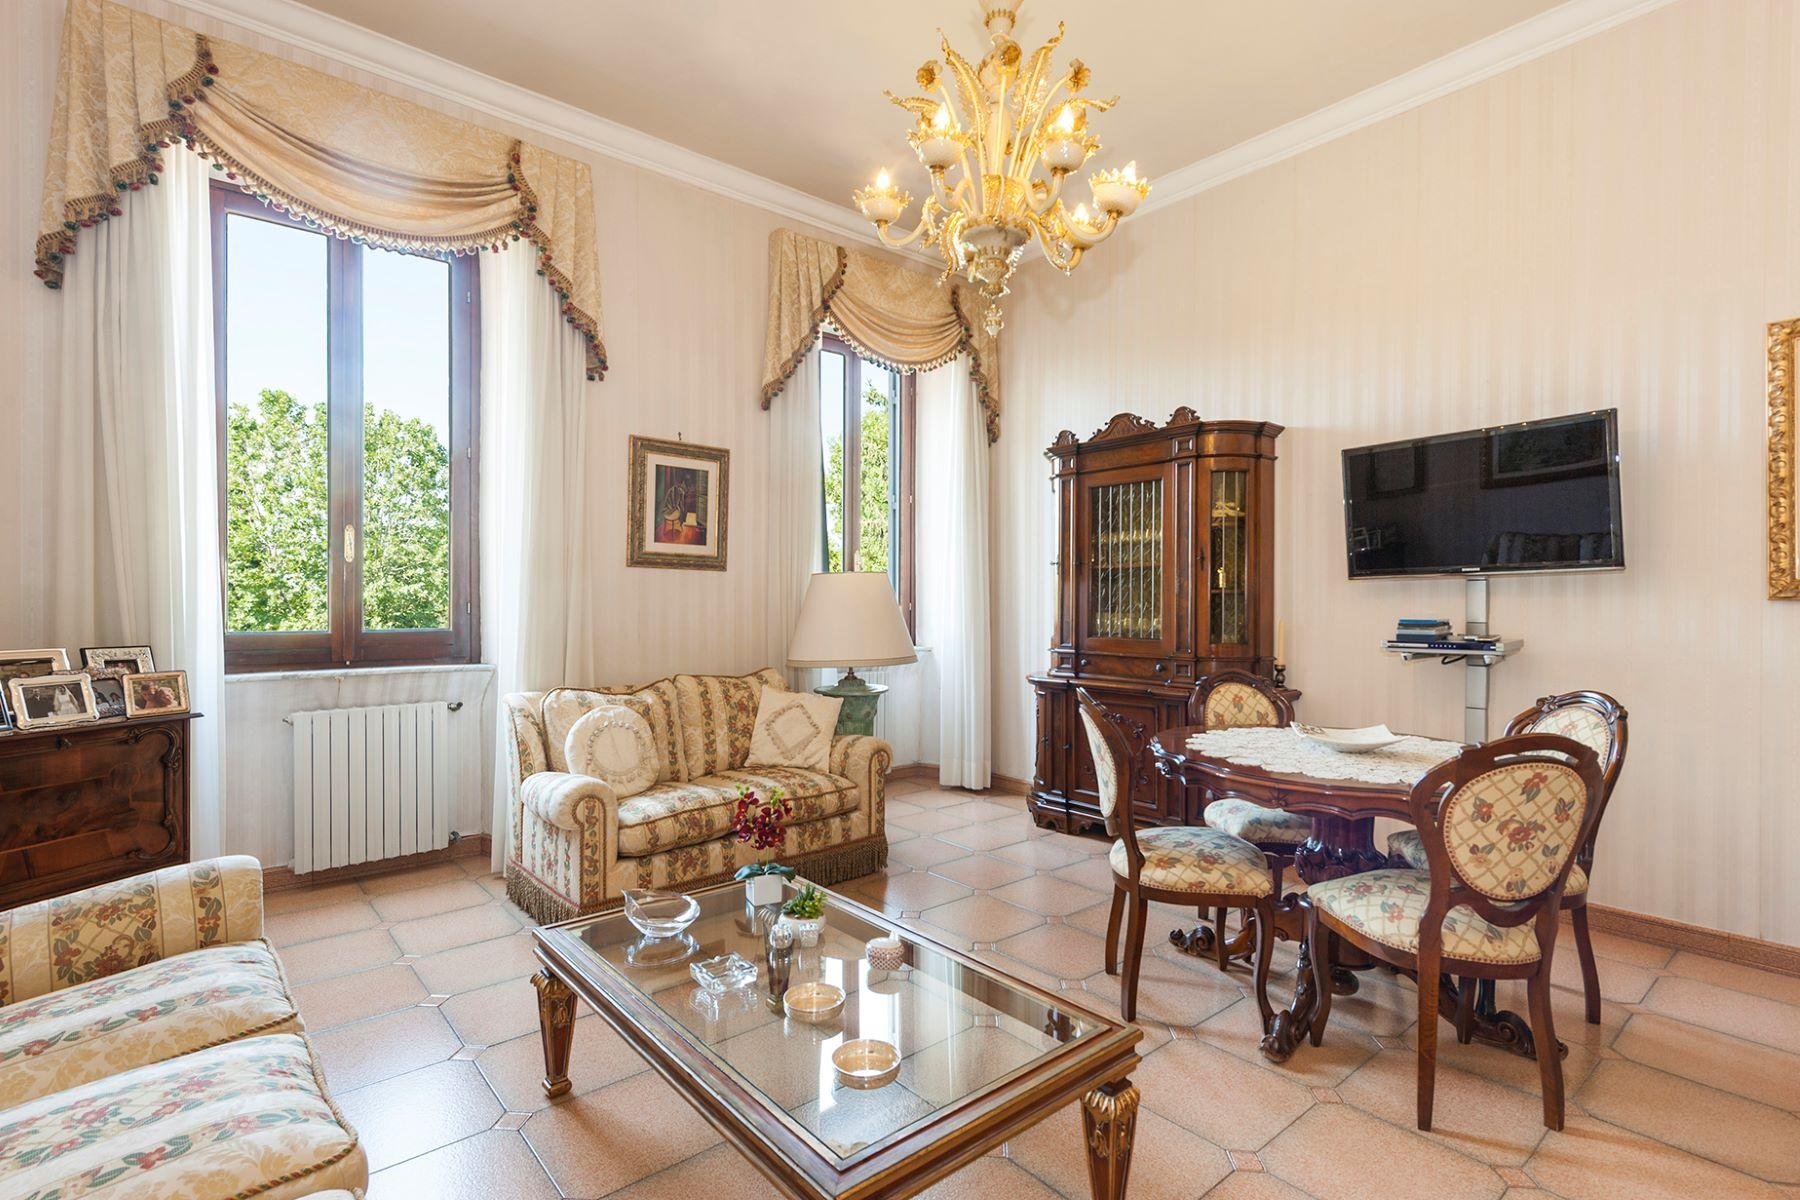 Apartamento por un Venta en Apartment in an exclusive building Ariccia, Roma Italia